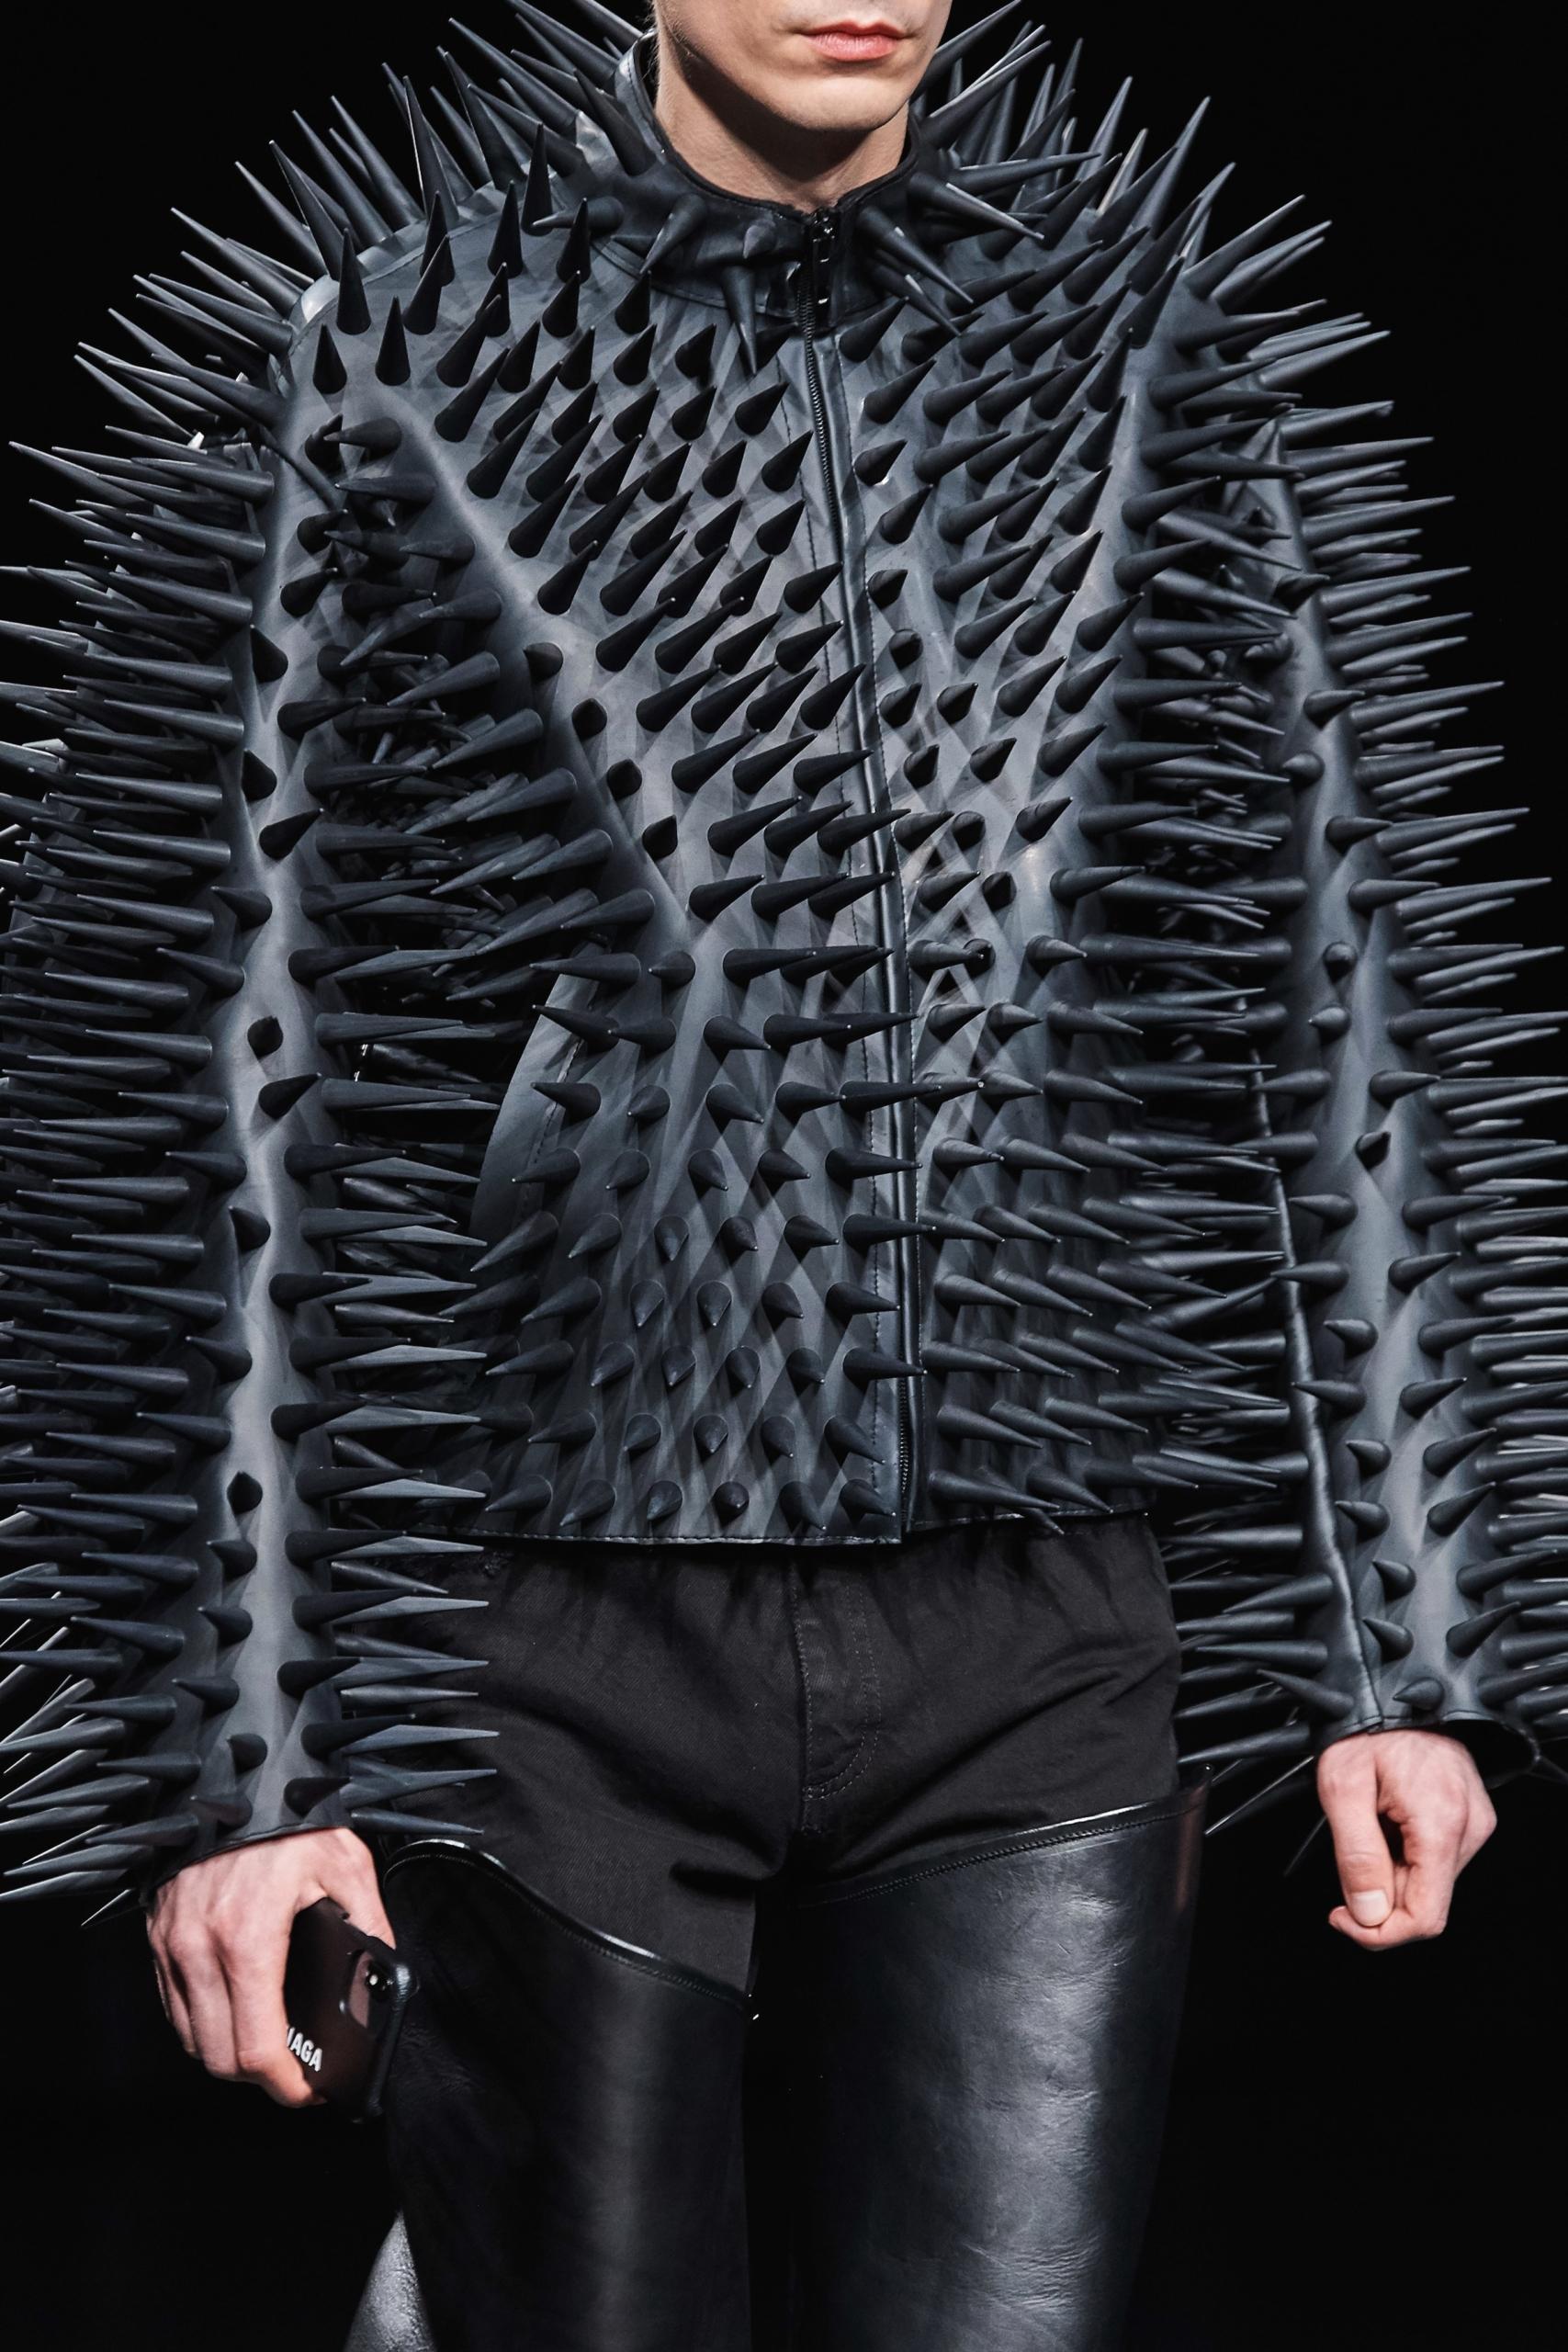 Balenciaga Fall/Winter 2020 Ready-to-Wear